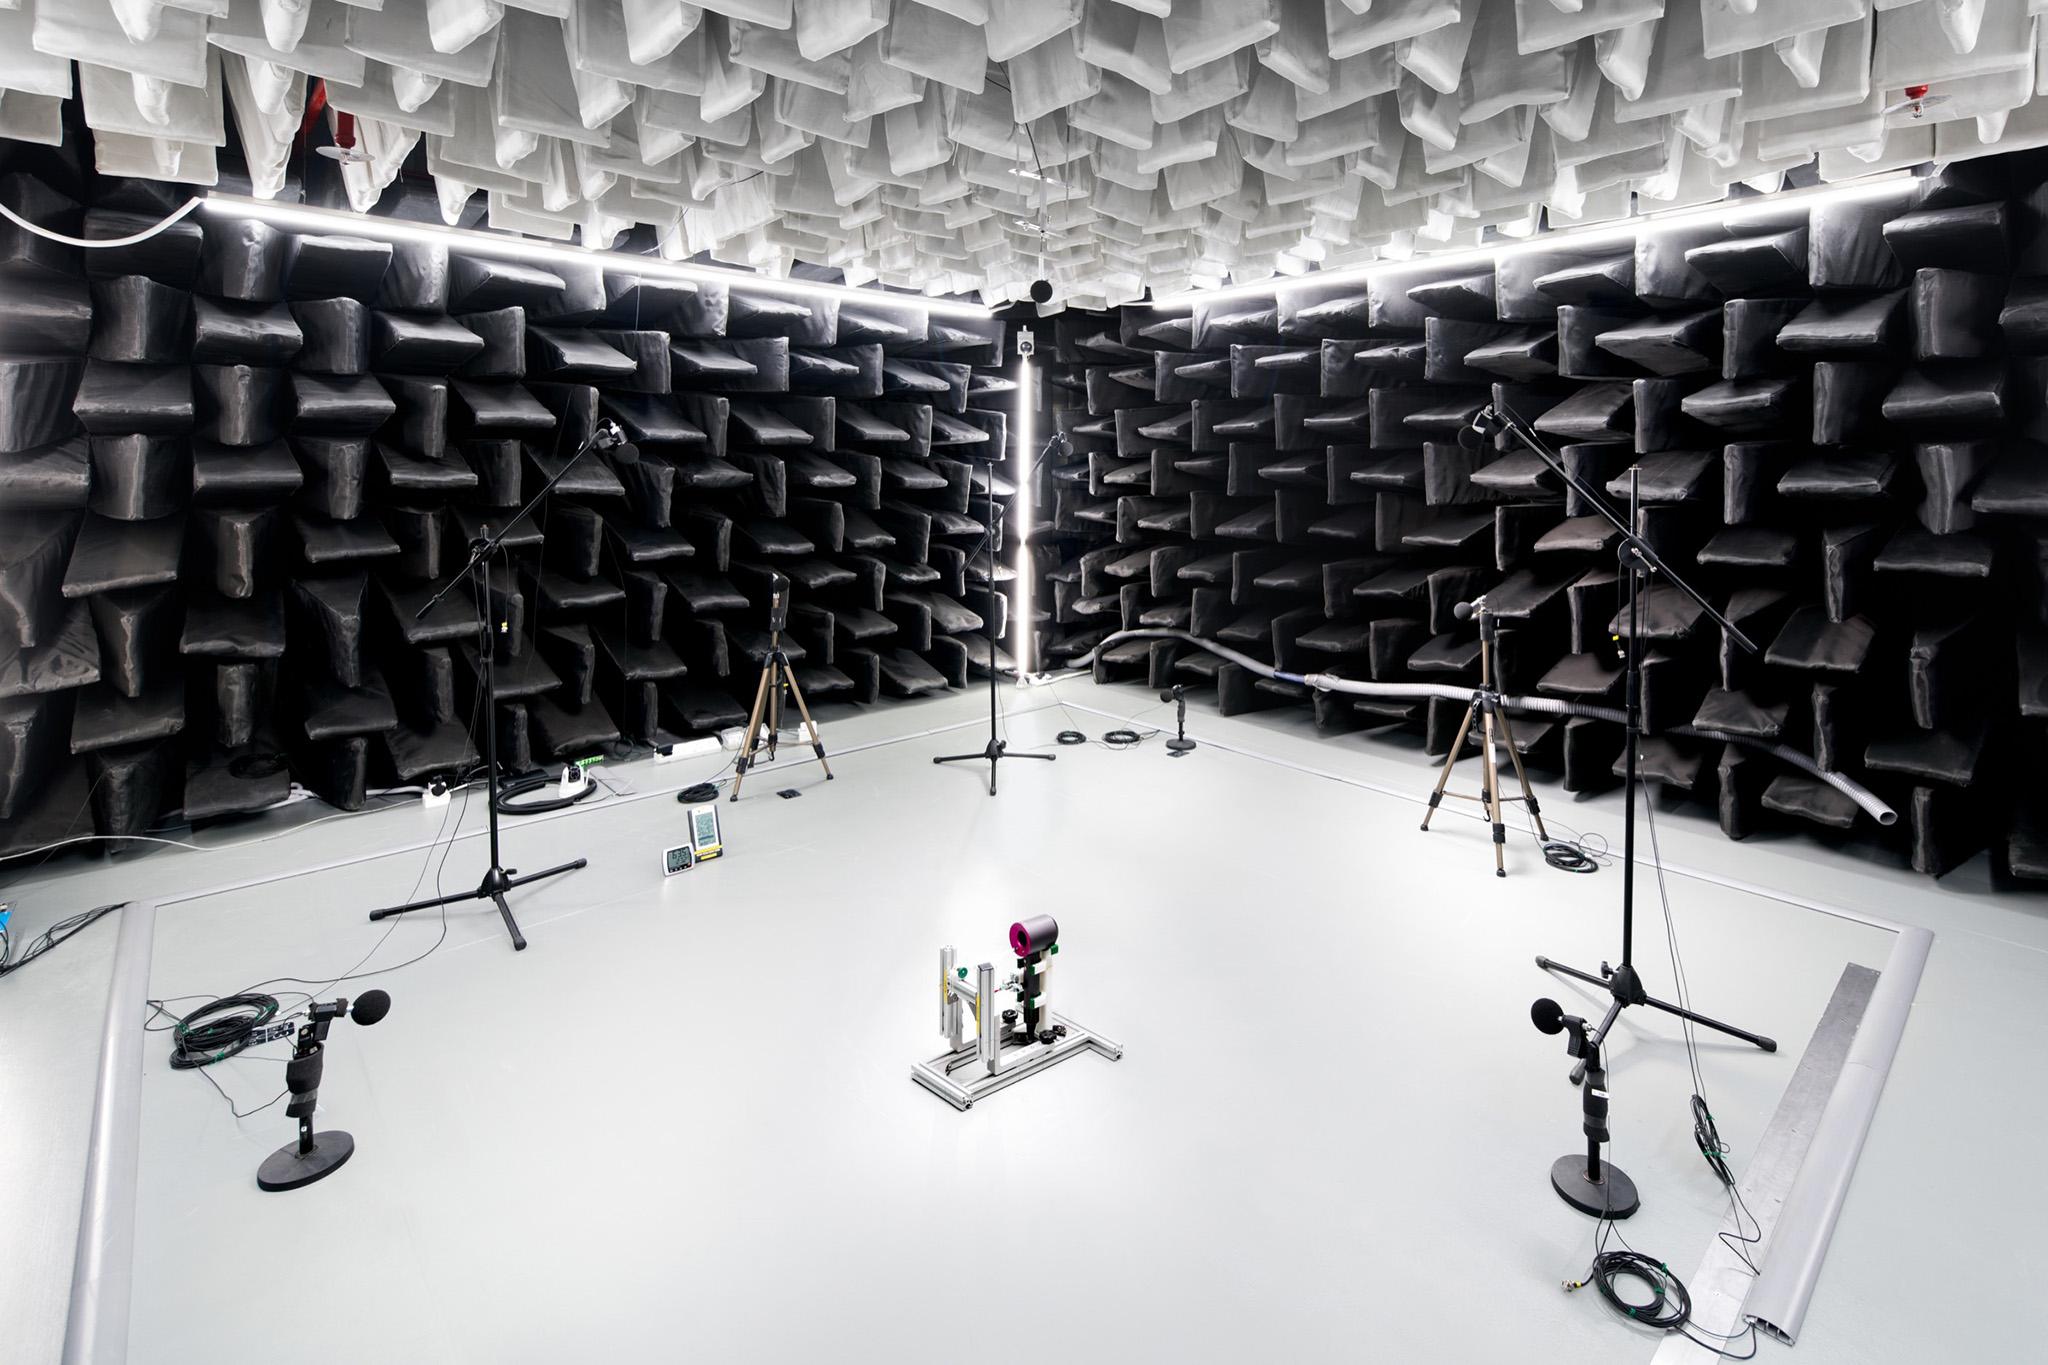 dyson-stc-acoustic-lab-01.jpg